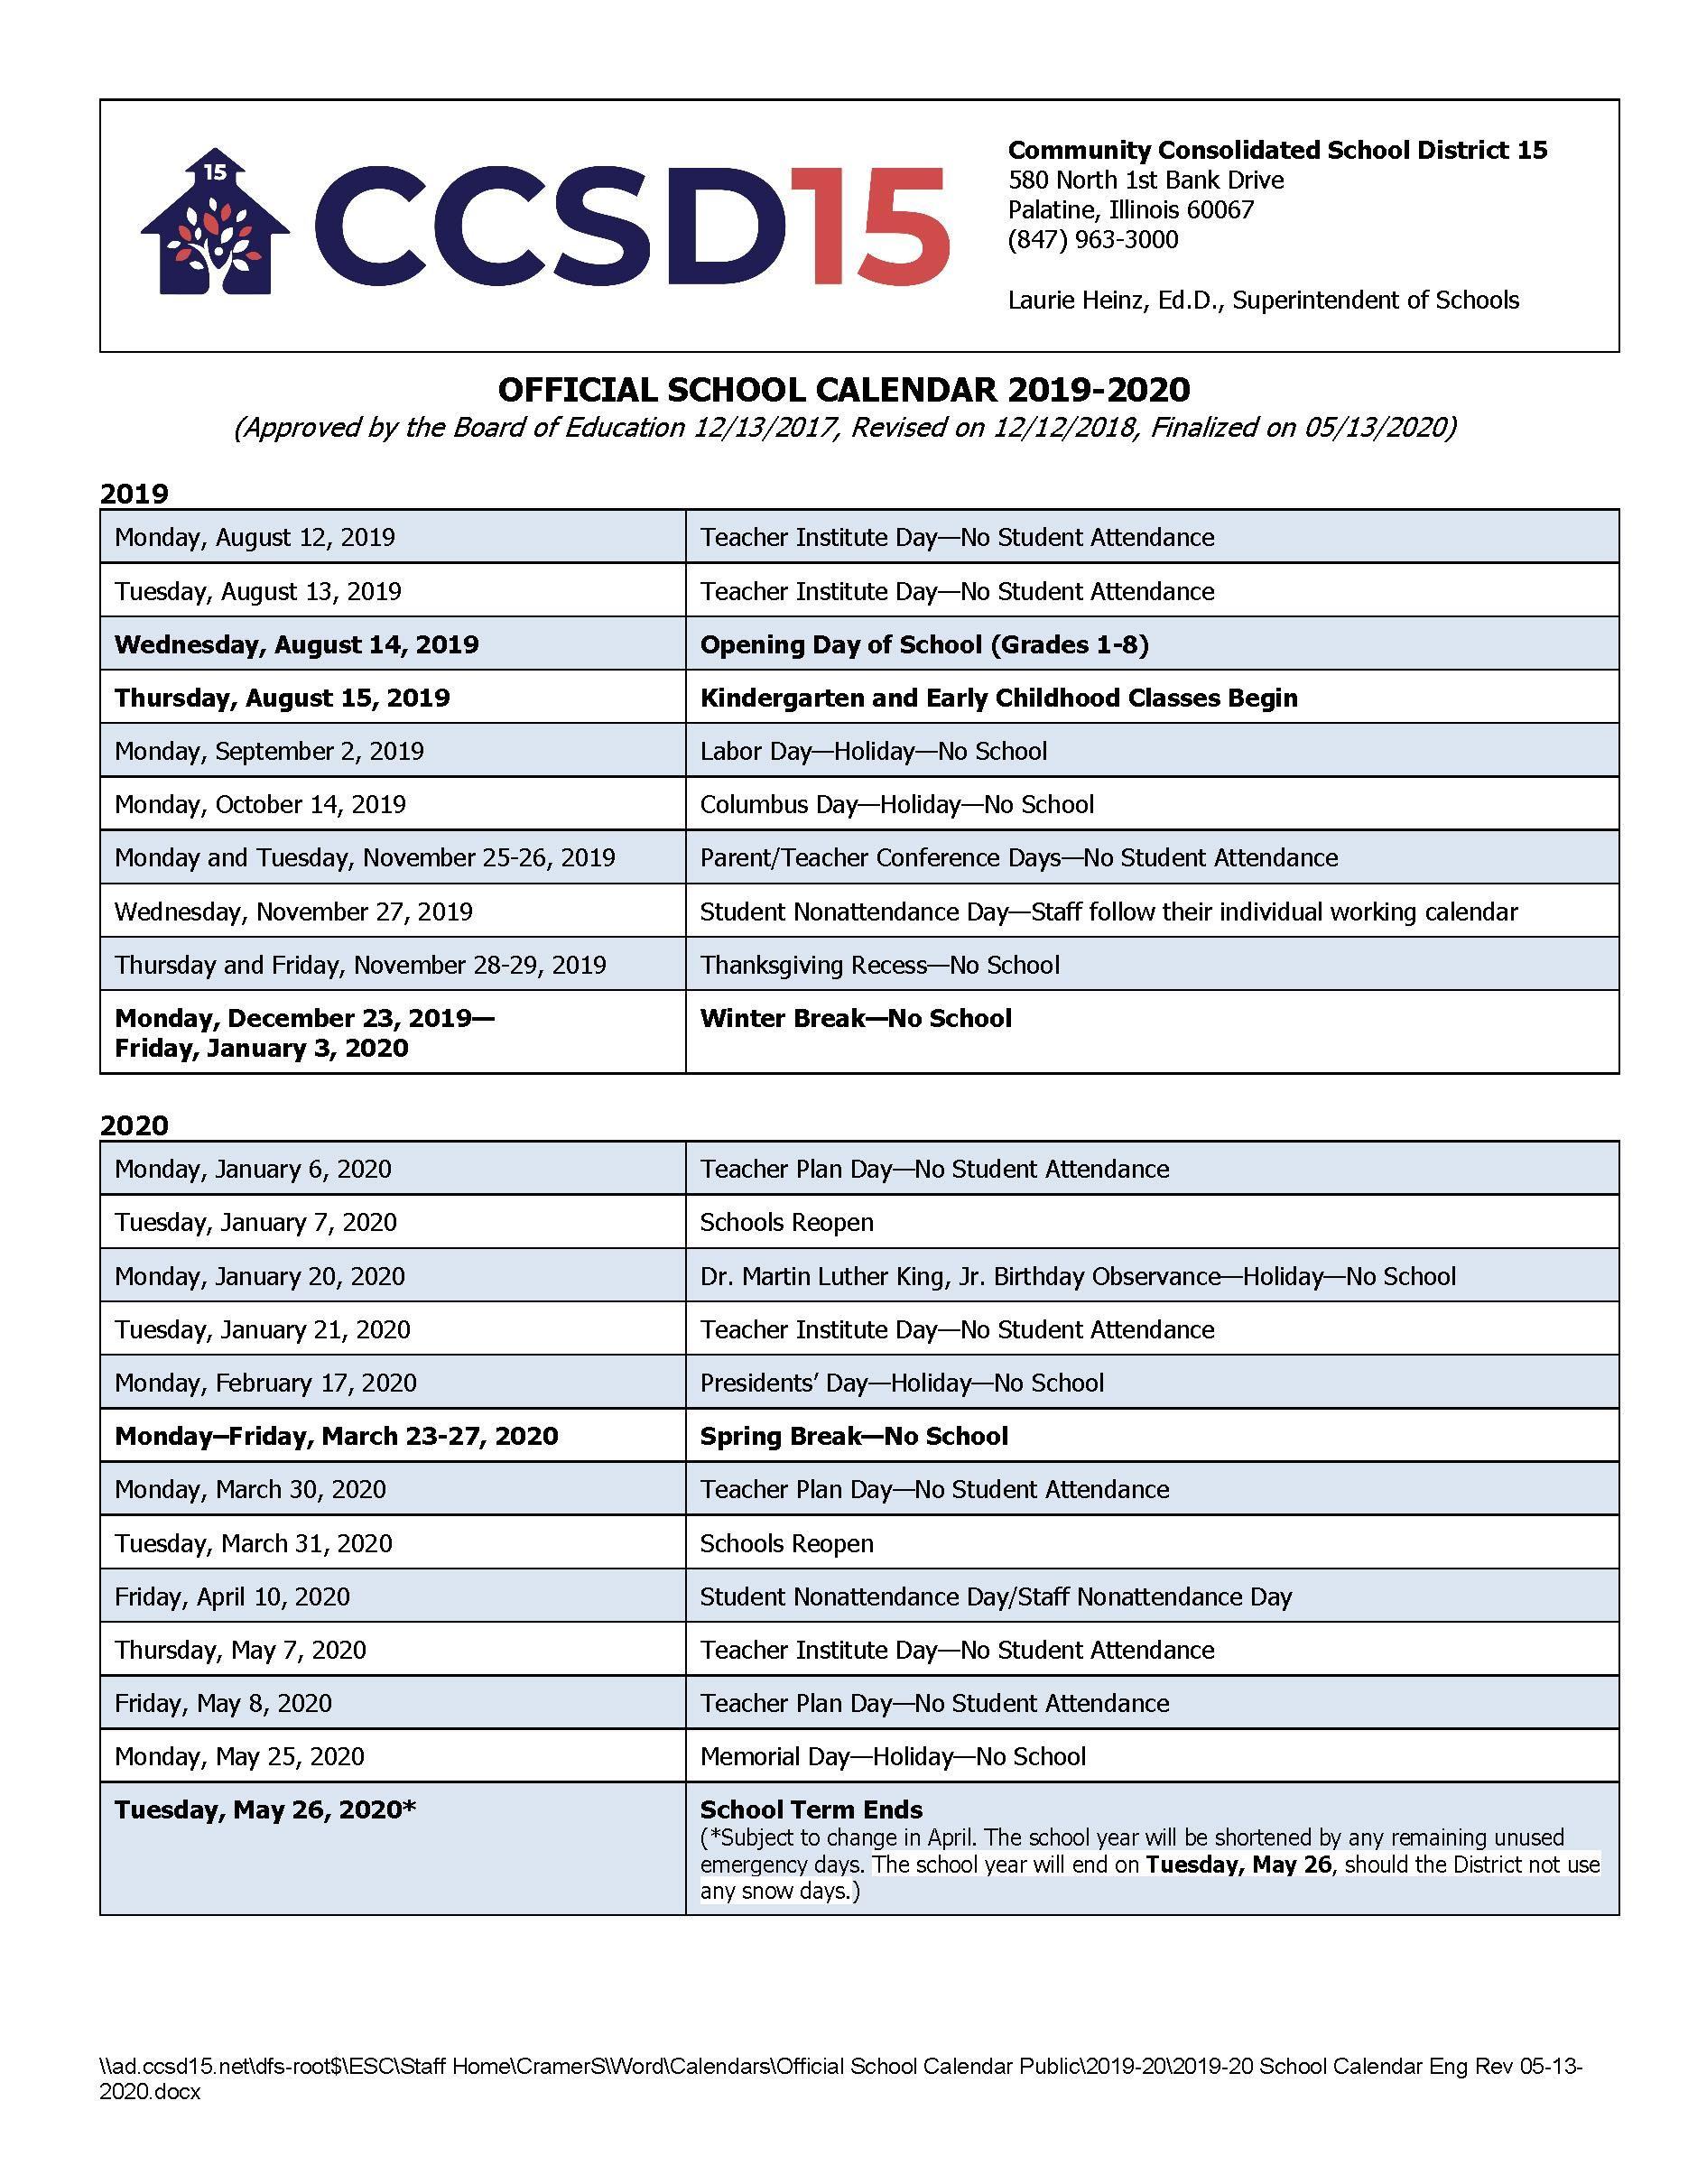 Calendars / 2019 20 Official School Calendar For St Charles Illinois School Calendar